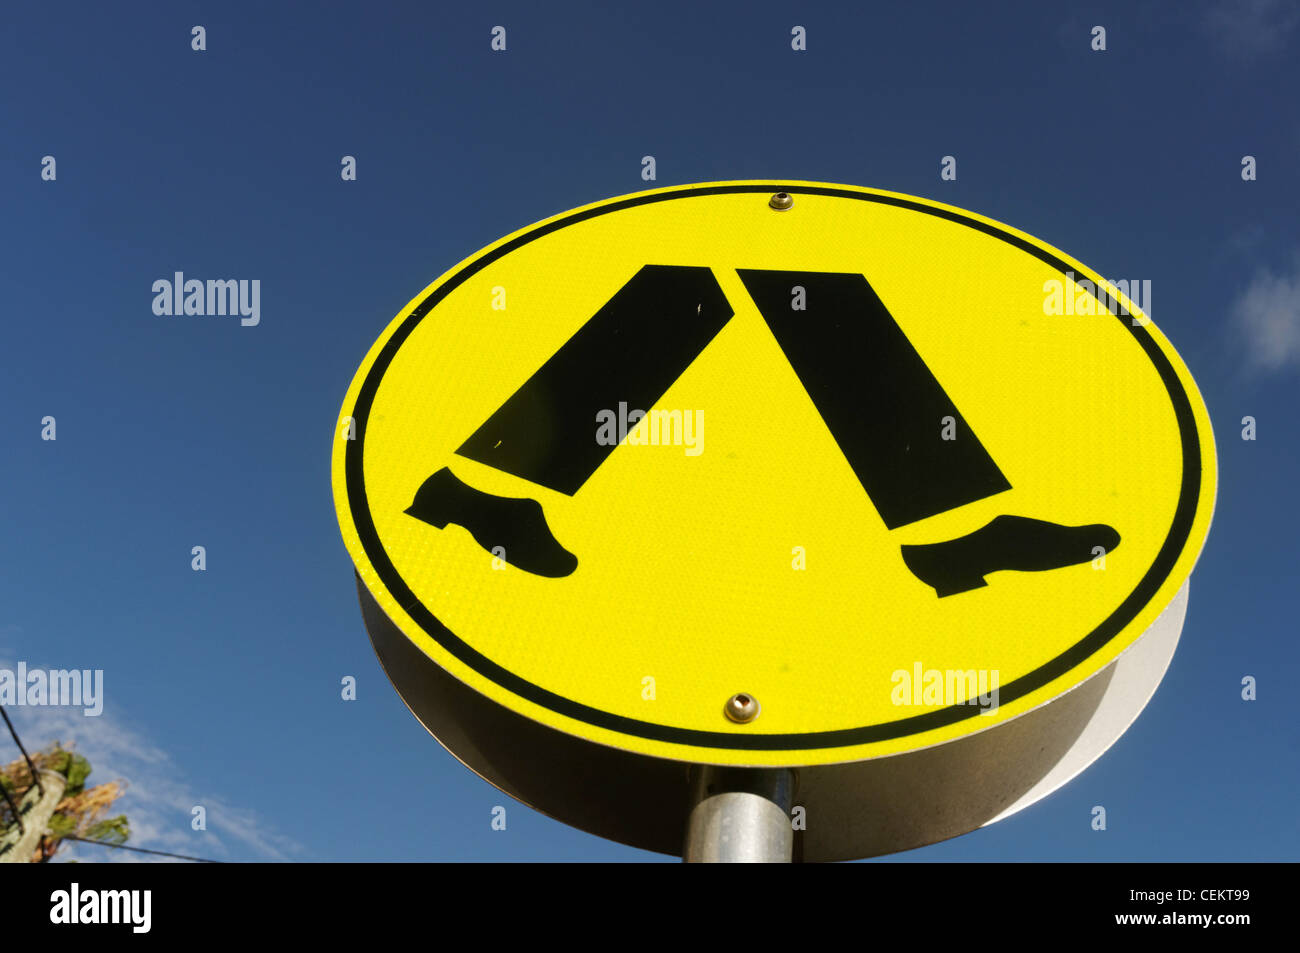 An Australian pedestrian crossing sign - Stock Image